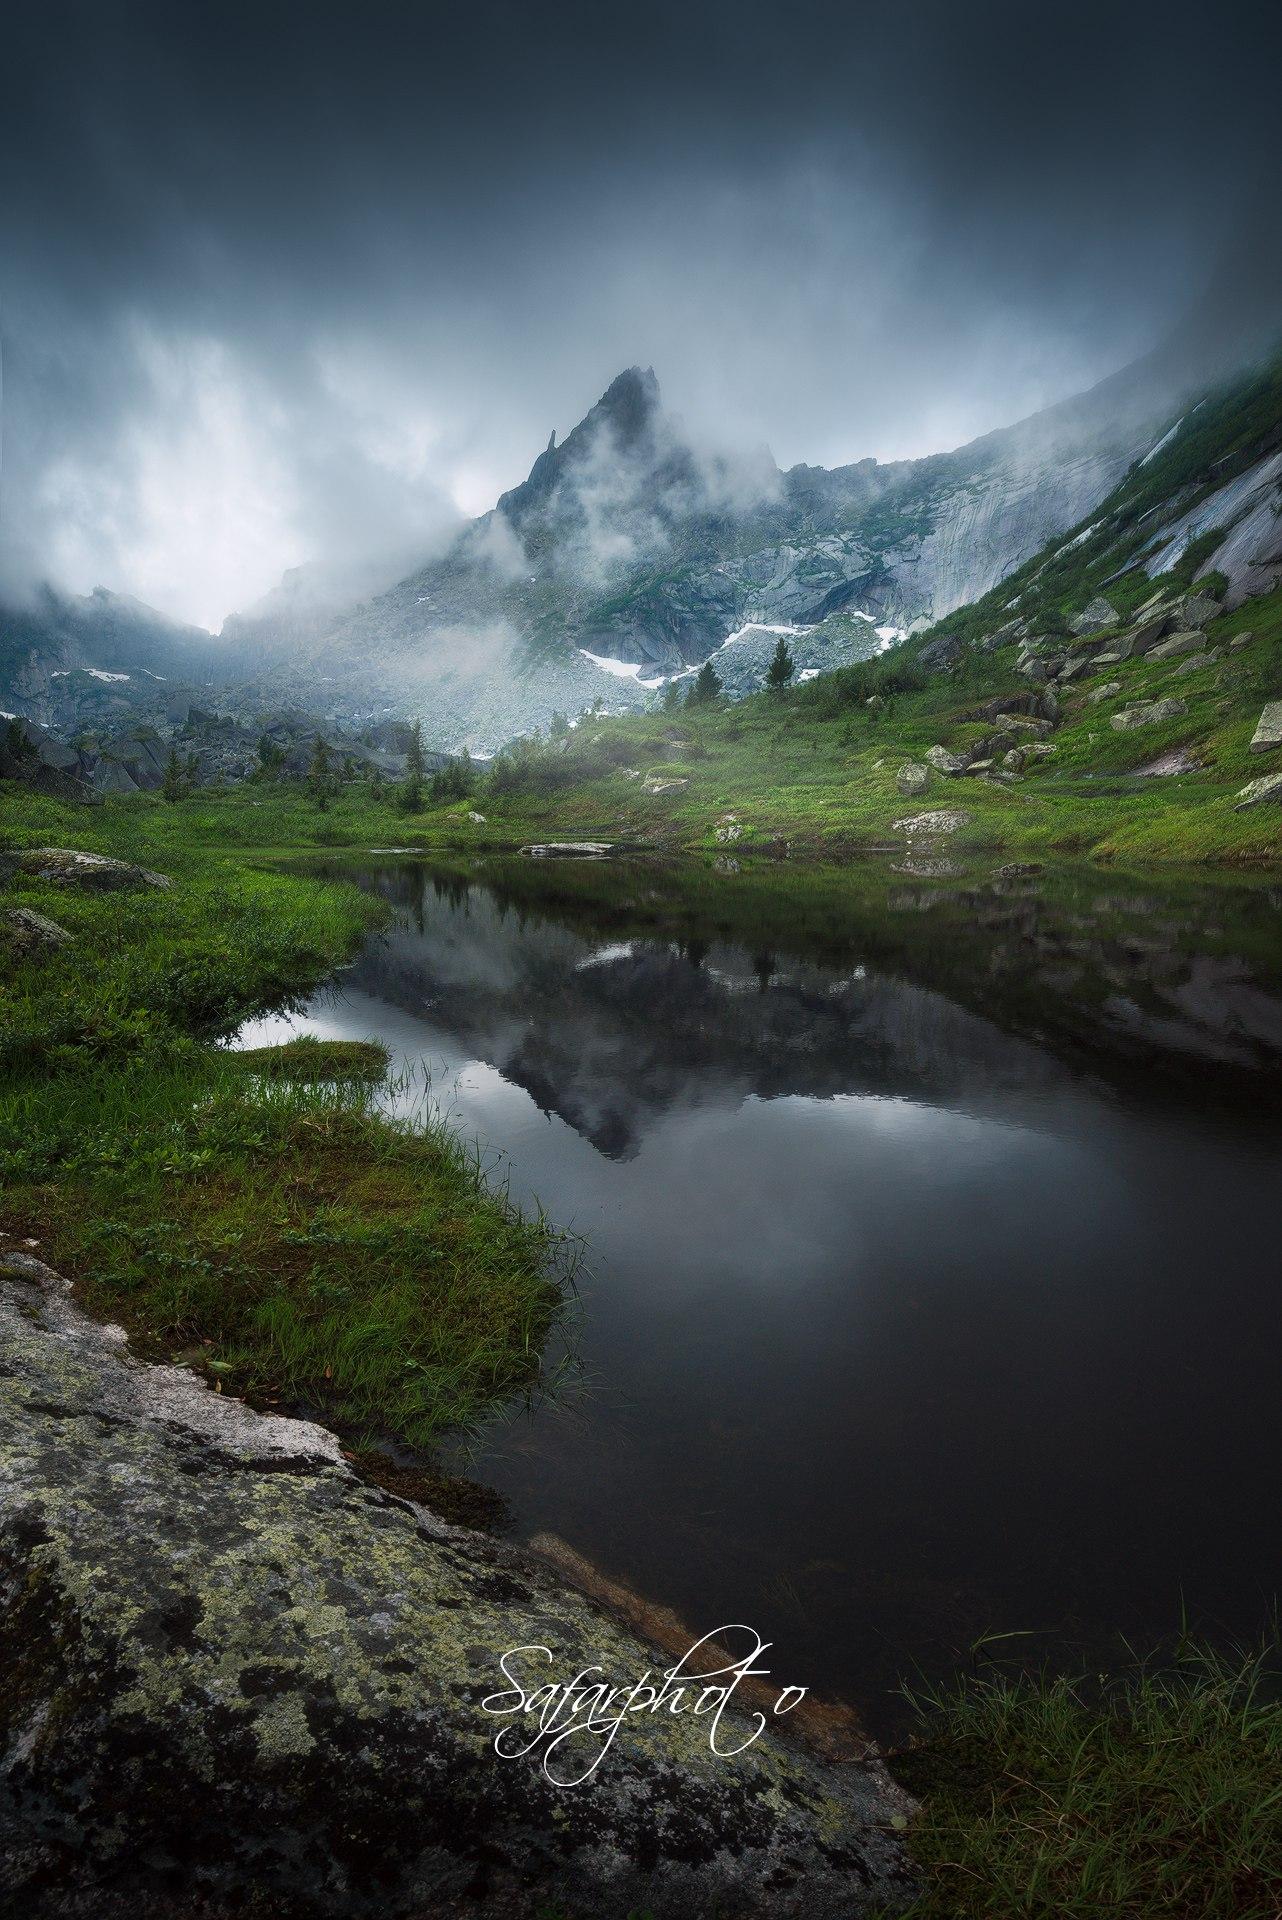 Фотографии Сафара Бахышева